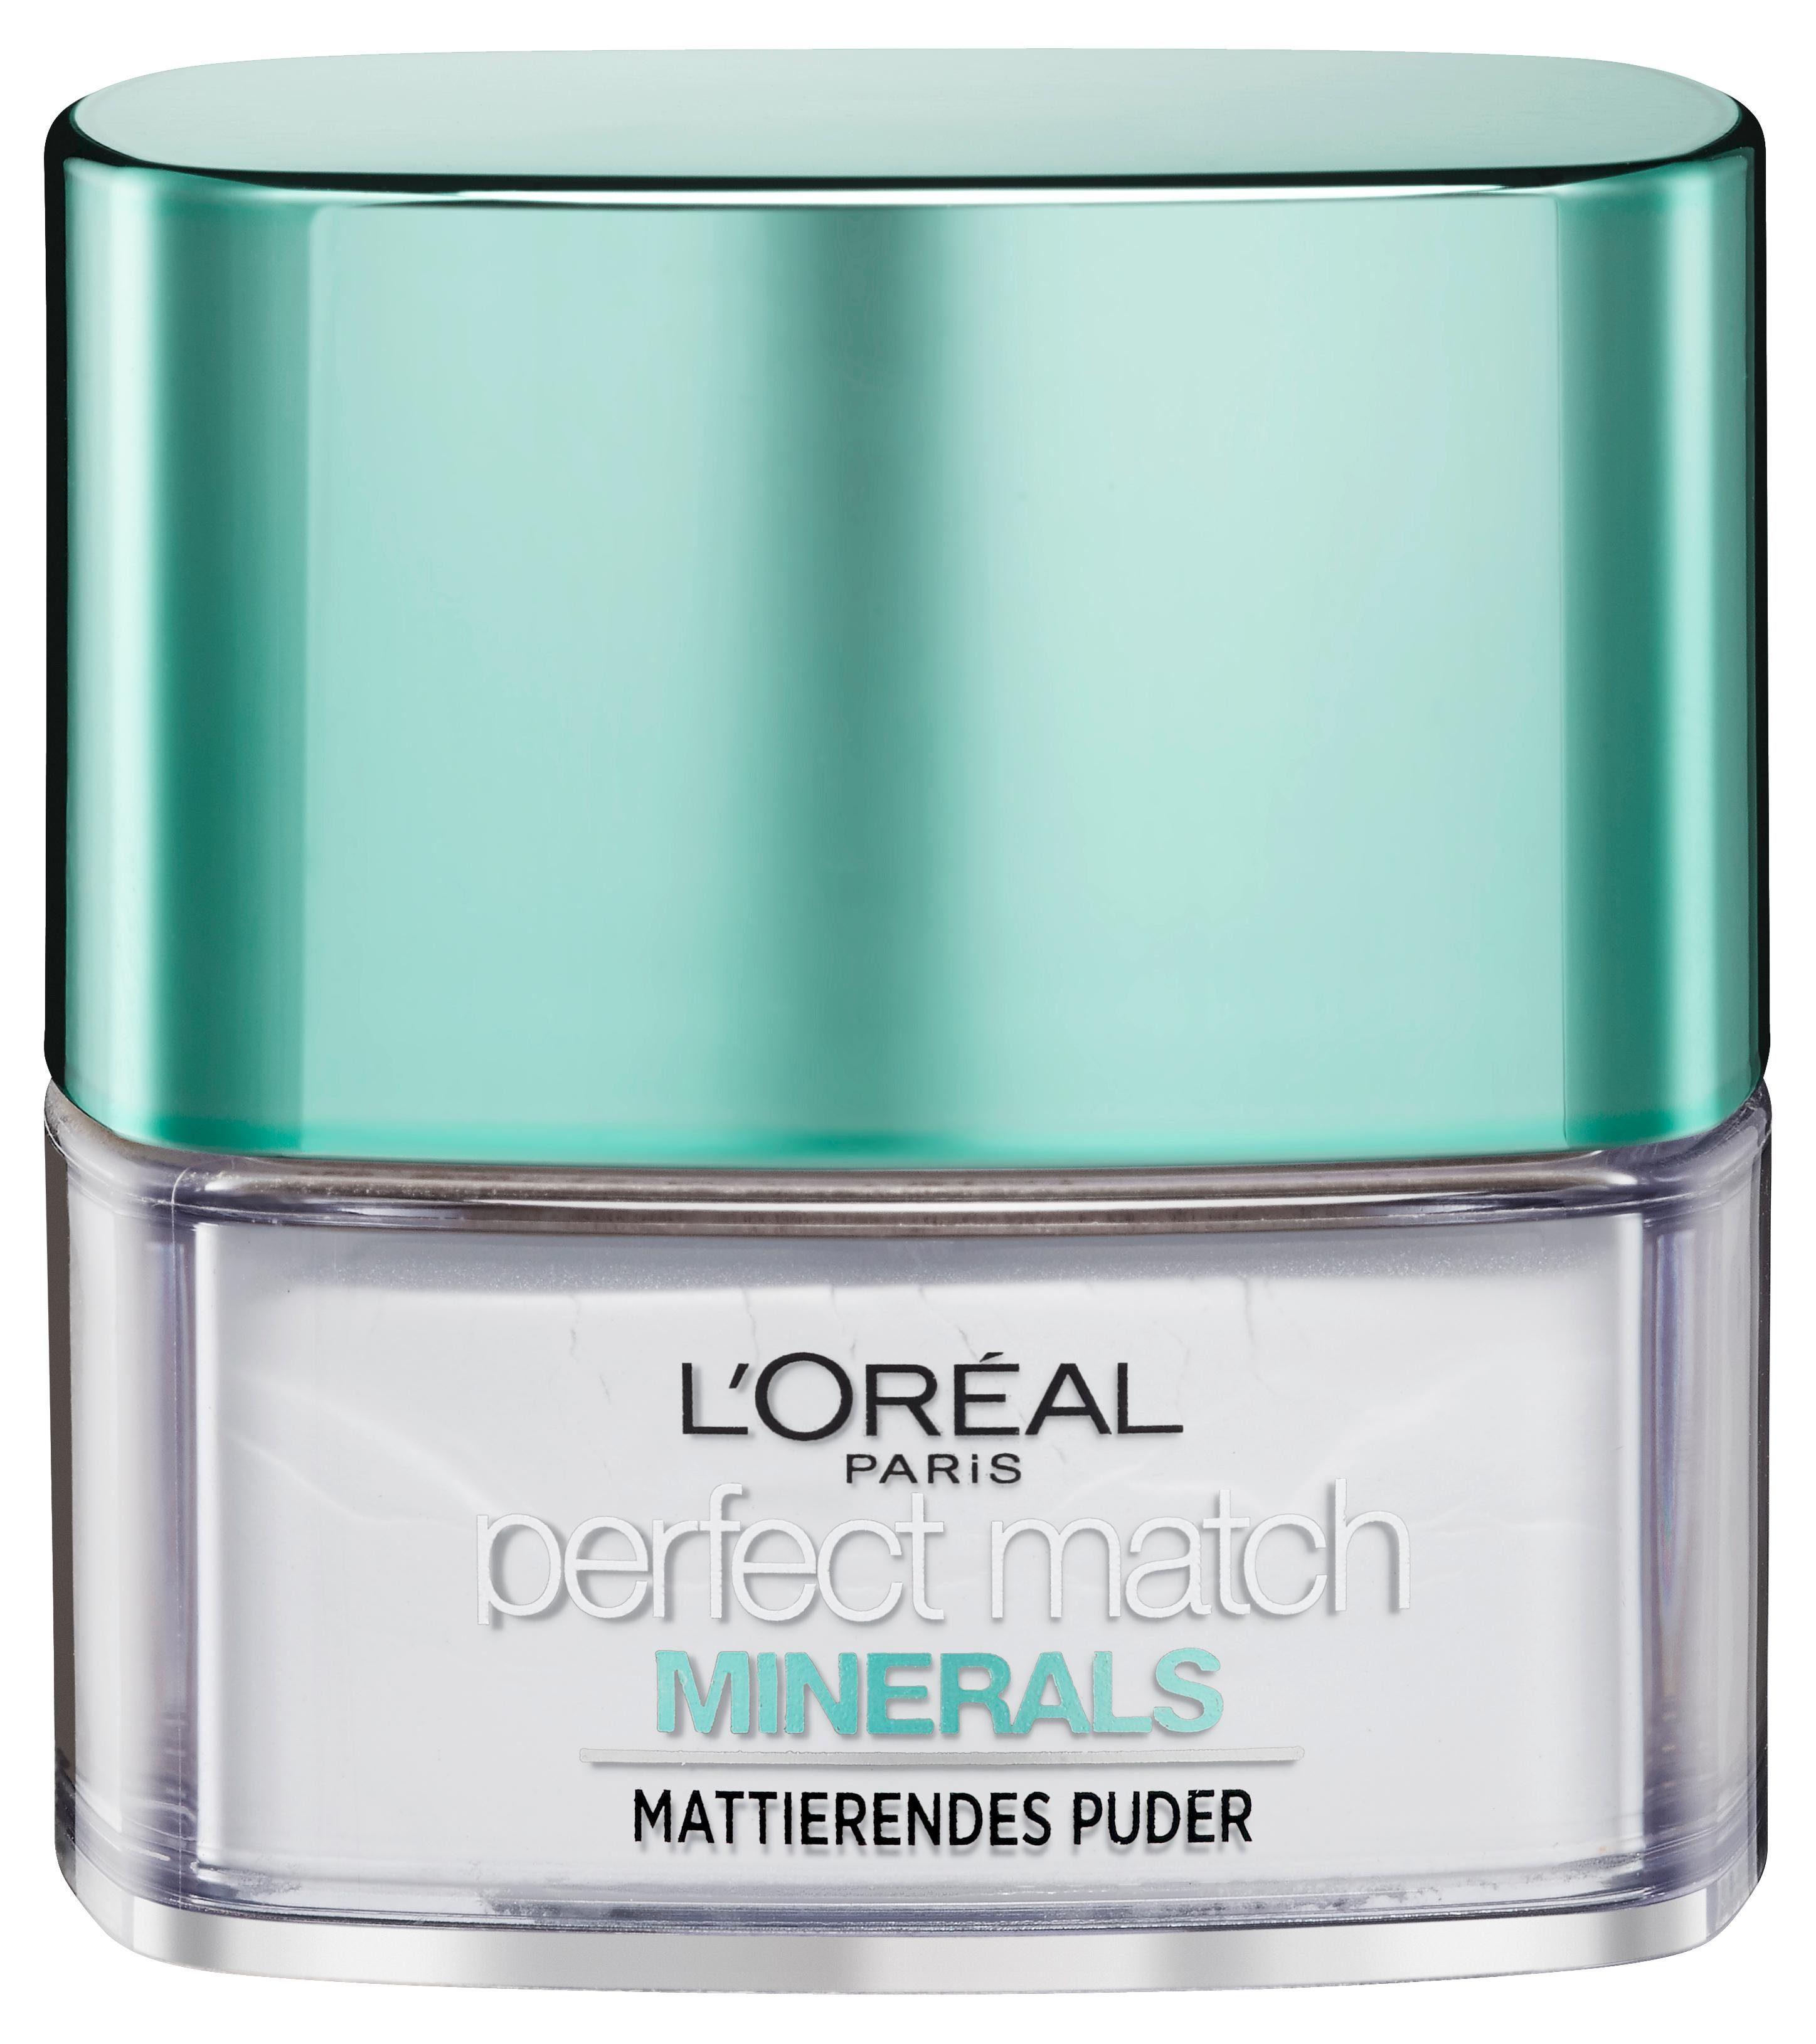 L'Oréal Paris, »Perfect Match Minerals Finishing«, Make-up